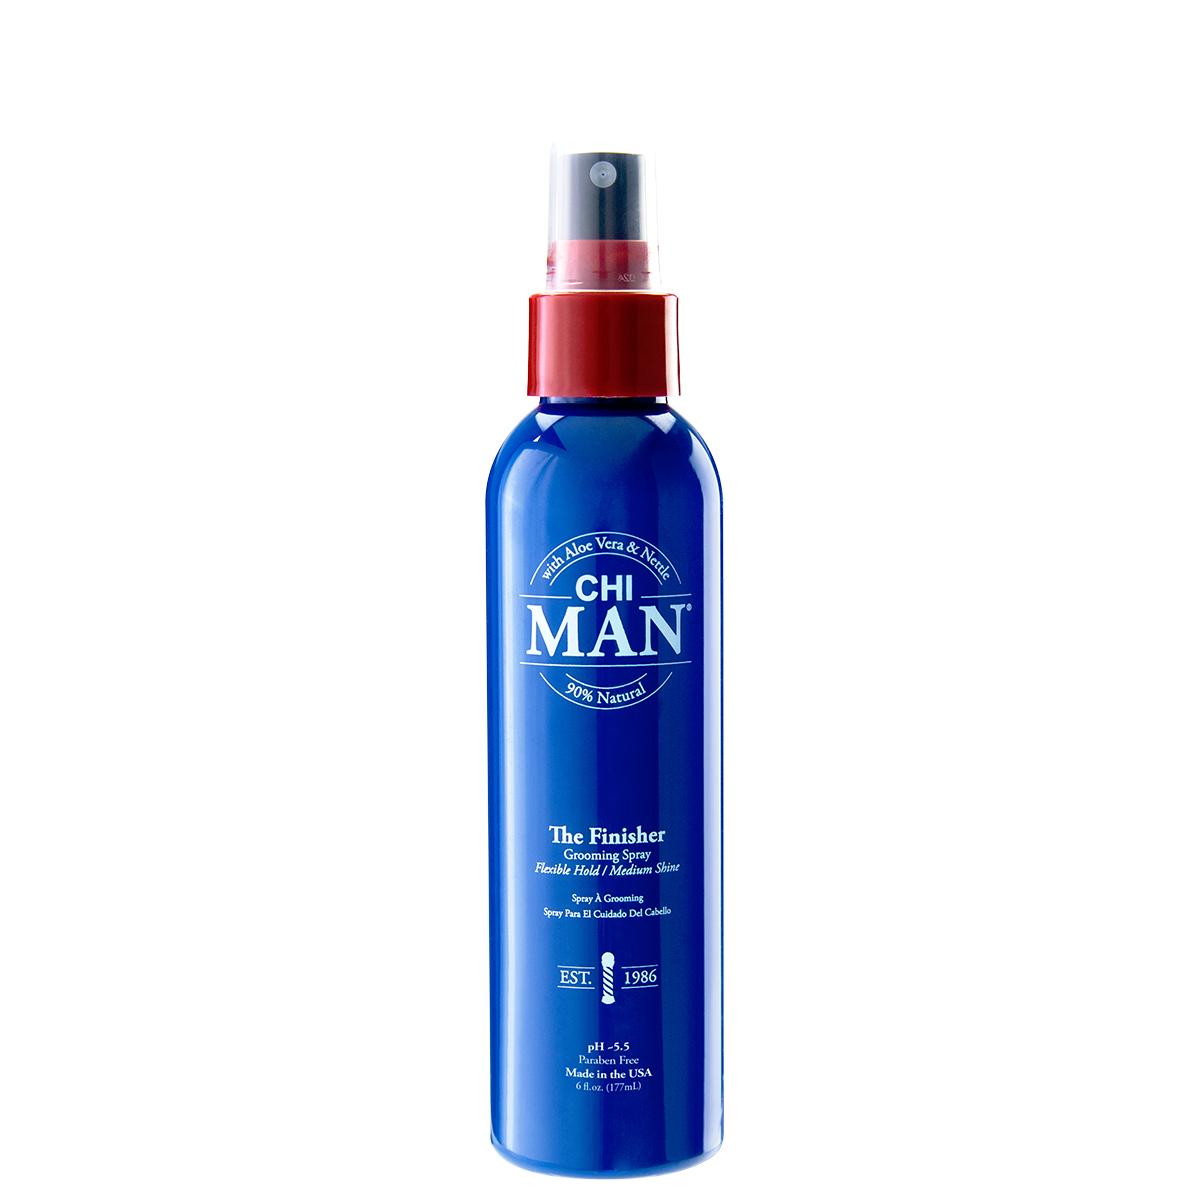 СПРЕЙ ЗА ГЪВКАВА ФИКСАЦИЯ CHI Man The Finisher Grooming Spray 177ml